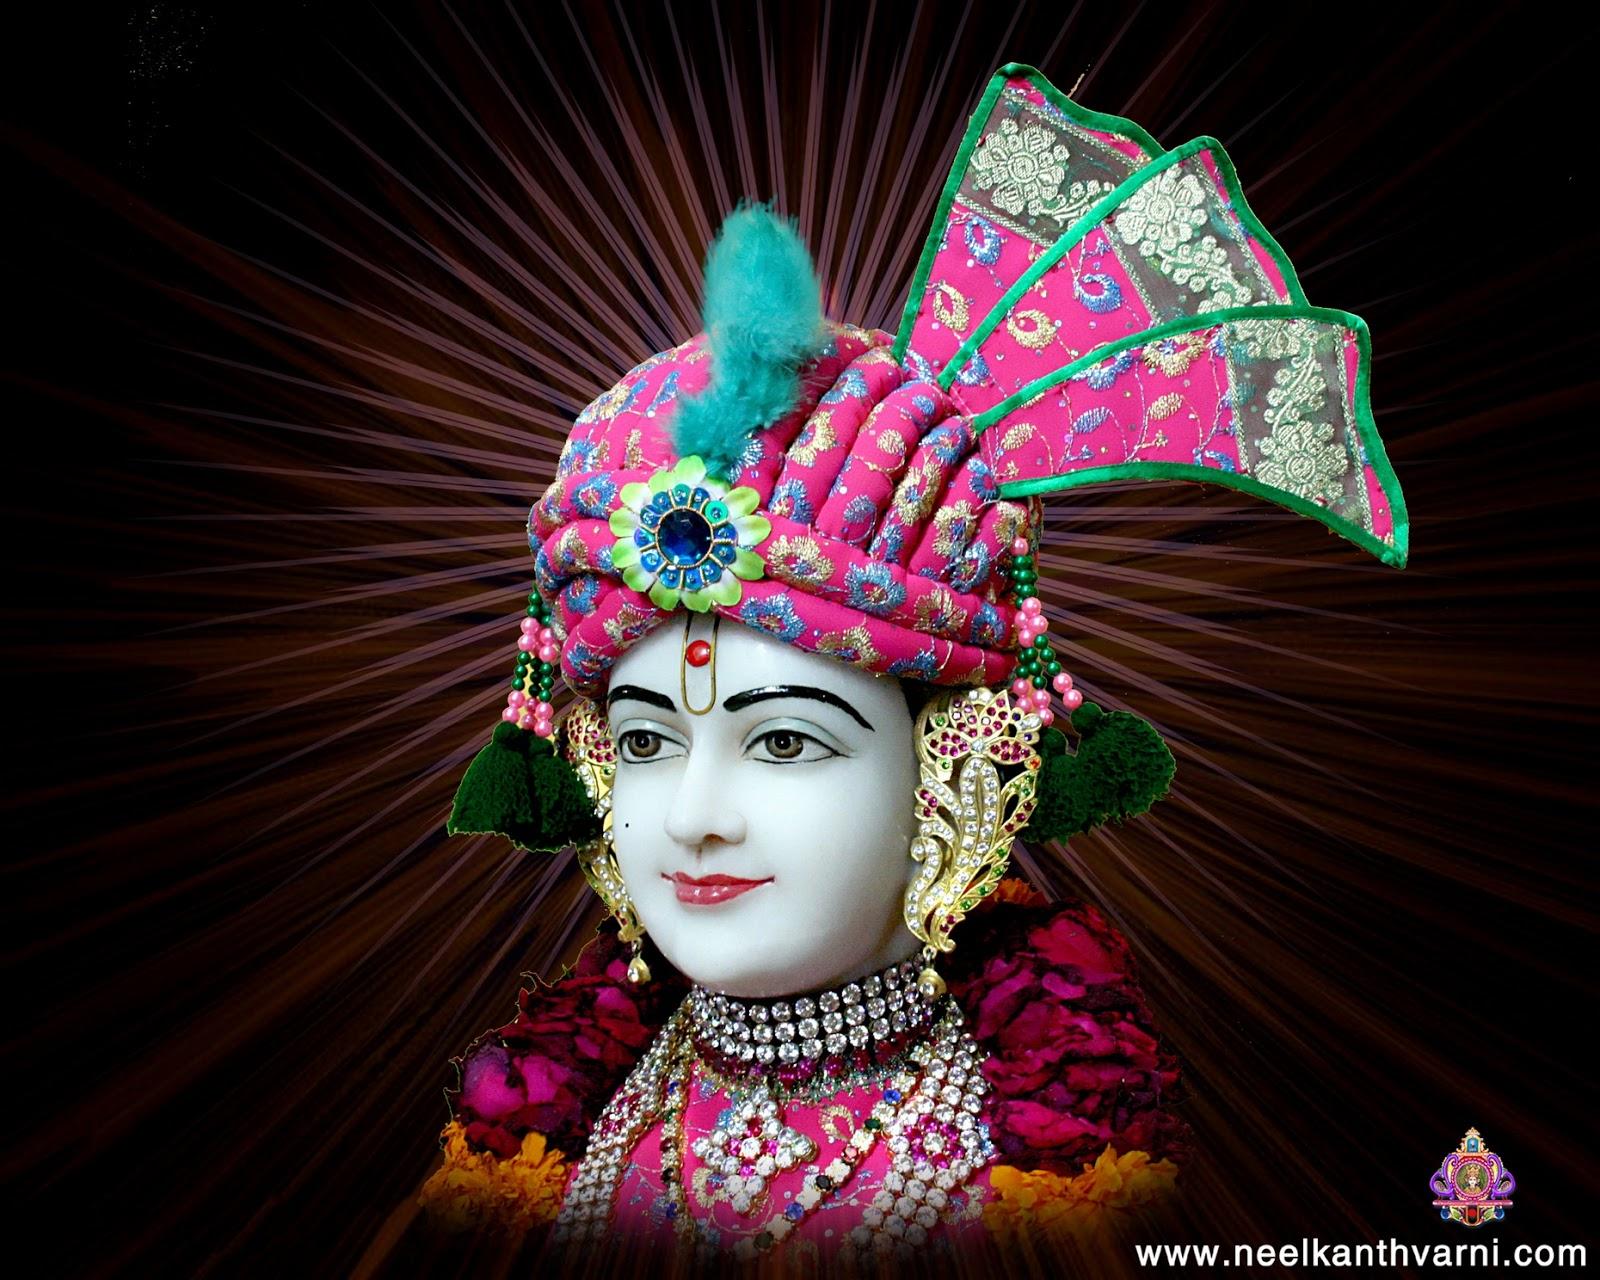 Pramukh Swami 3d Wallpaper Jay Swaminarayan Wallpapers Ghanshyam Maharaj Hd